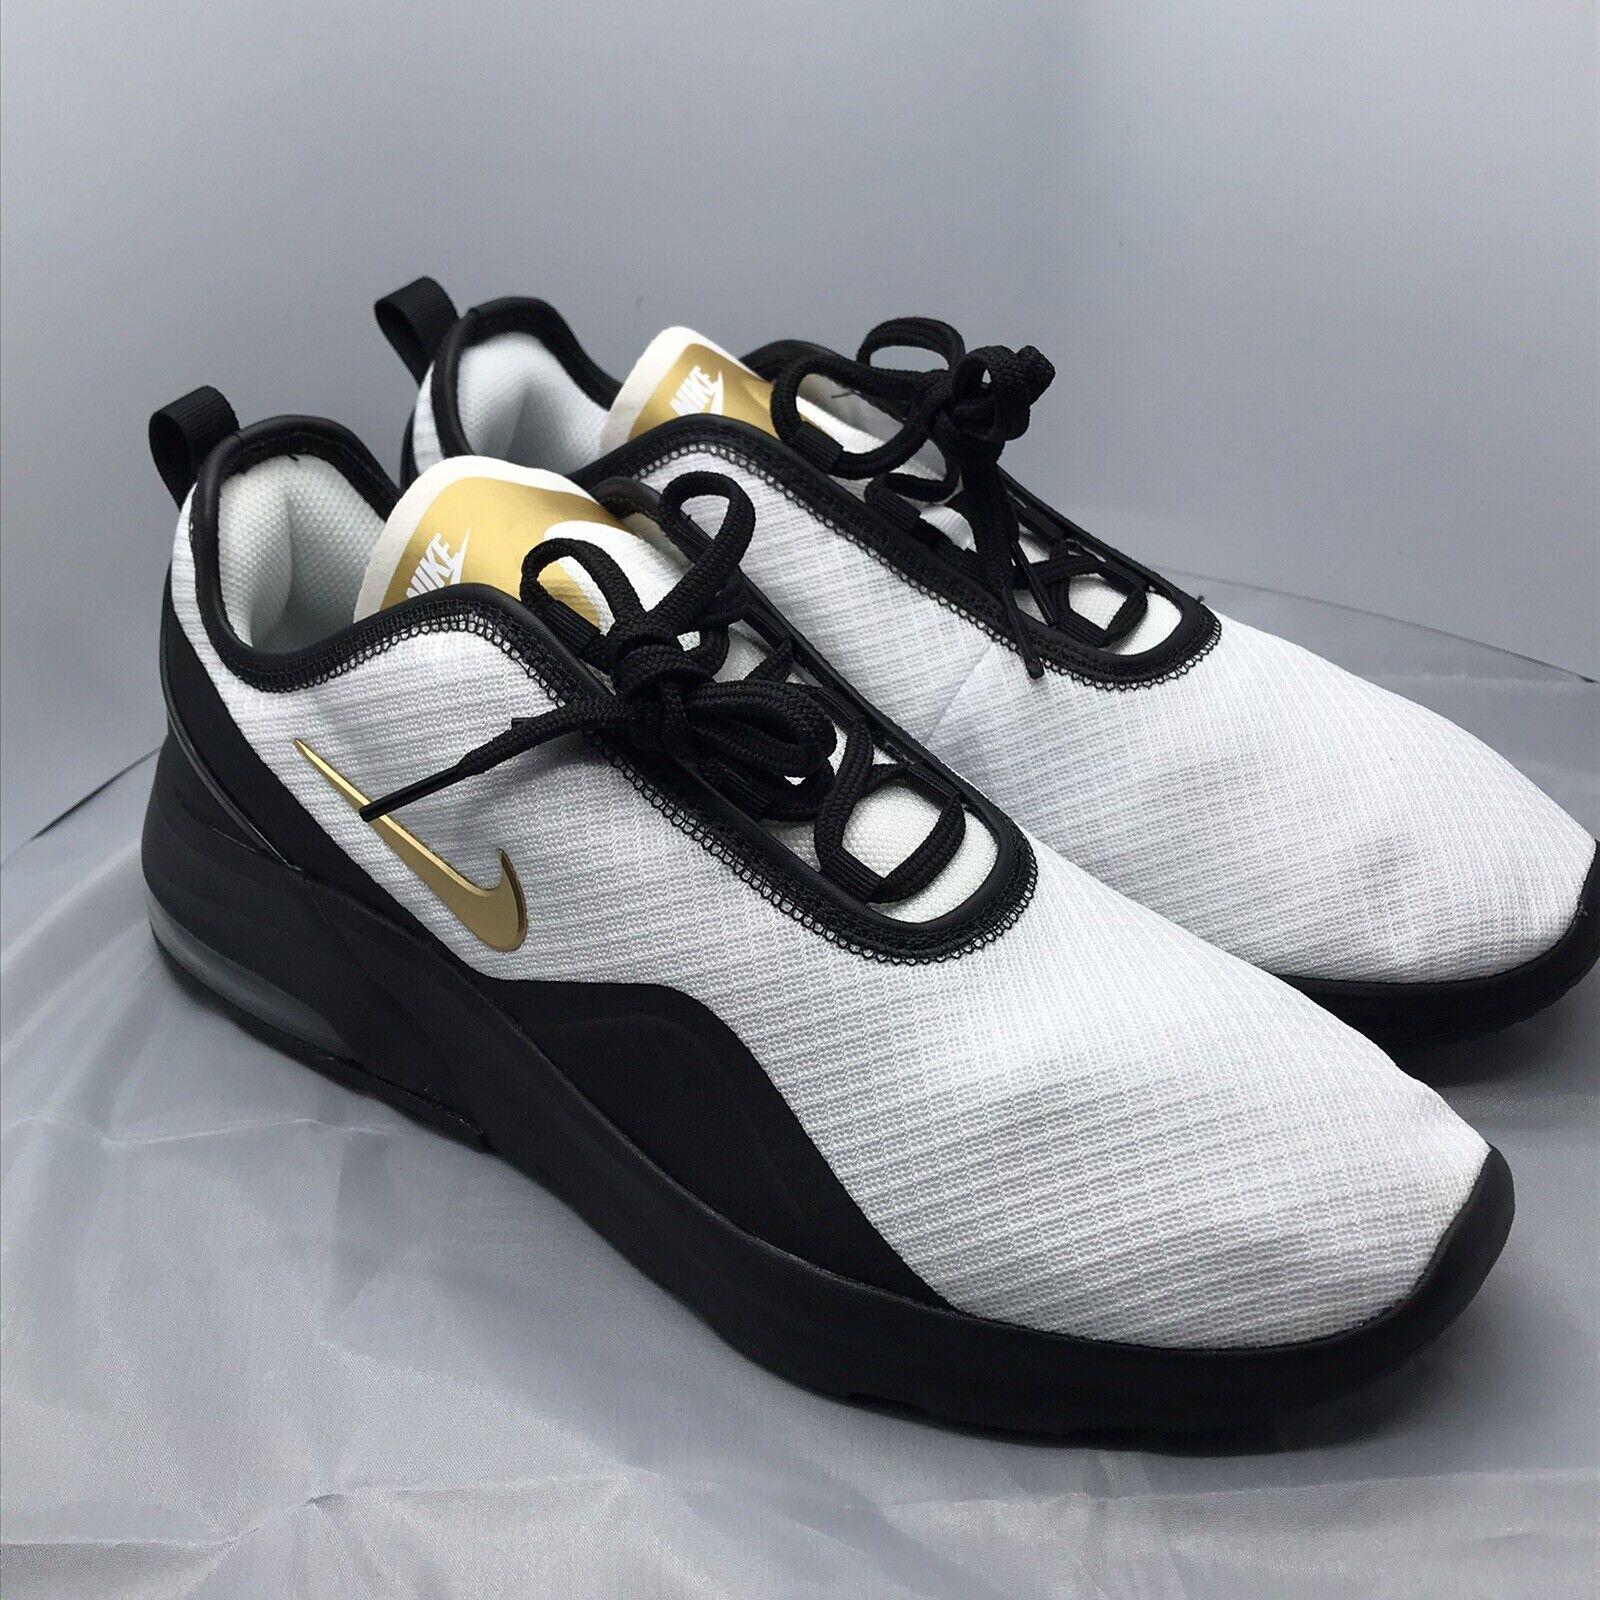 Nike Air Max Motion 2 Ct1103 001 Black White Metallic Gold Mens Size 12